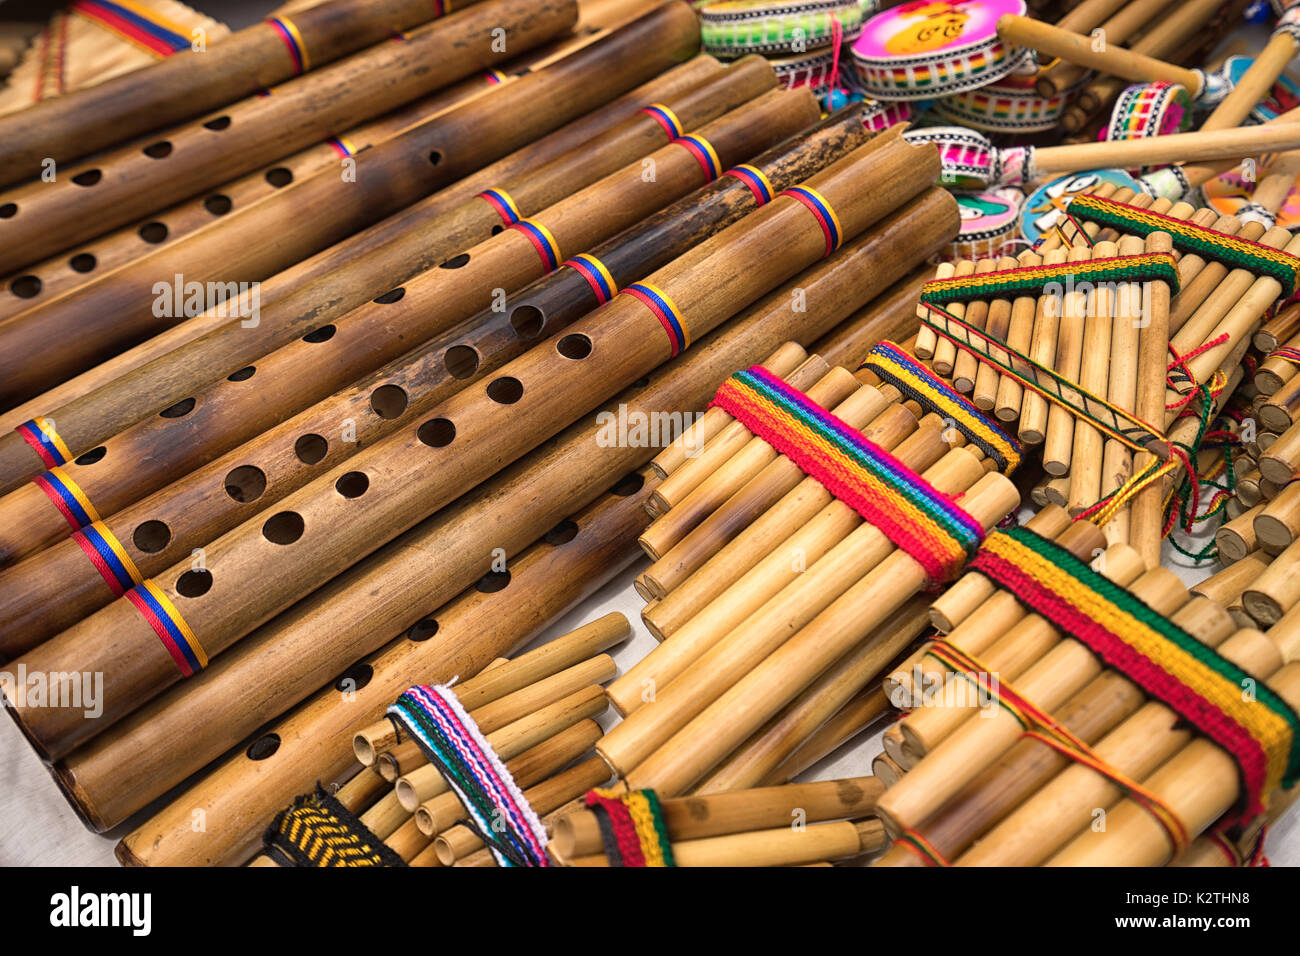 panflute closeup in the indigenous artisan market in Otavalo Ecuador - Stock Image